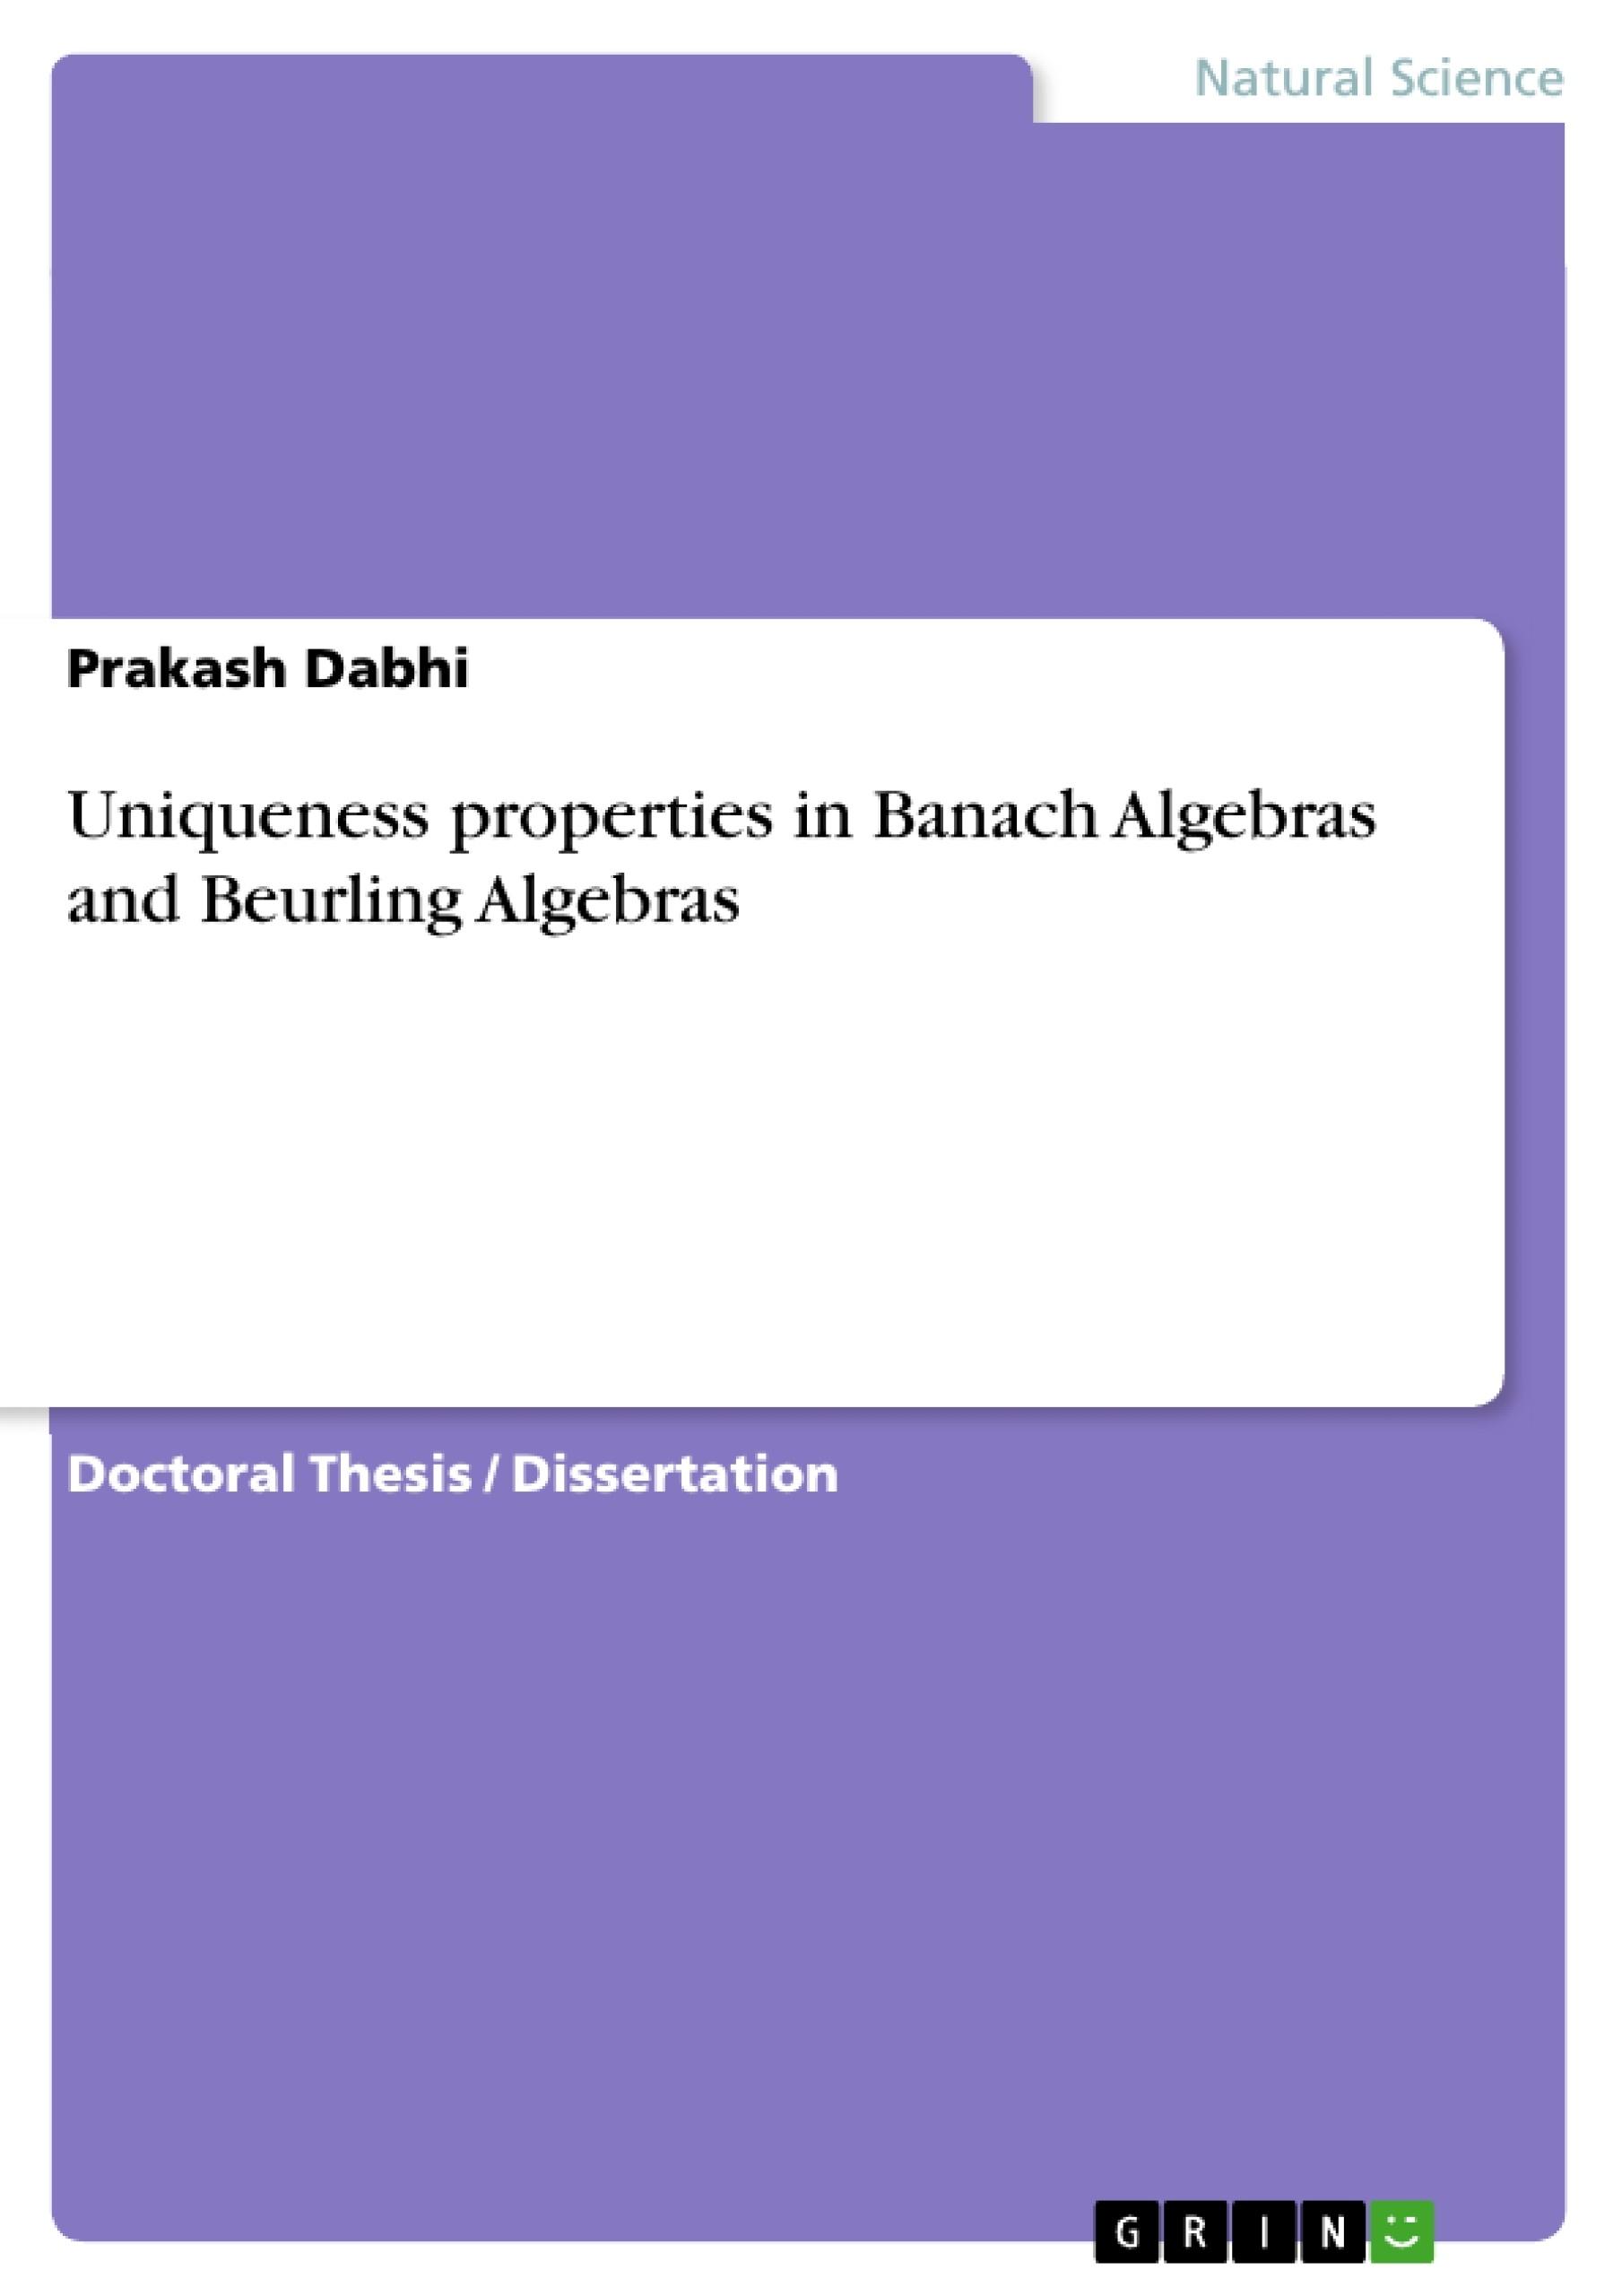 Title: Uniqueness properties in Banach Algebras and Beurling Algebras